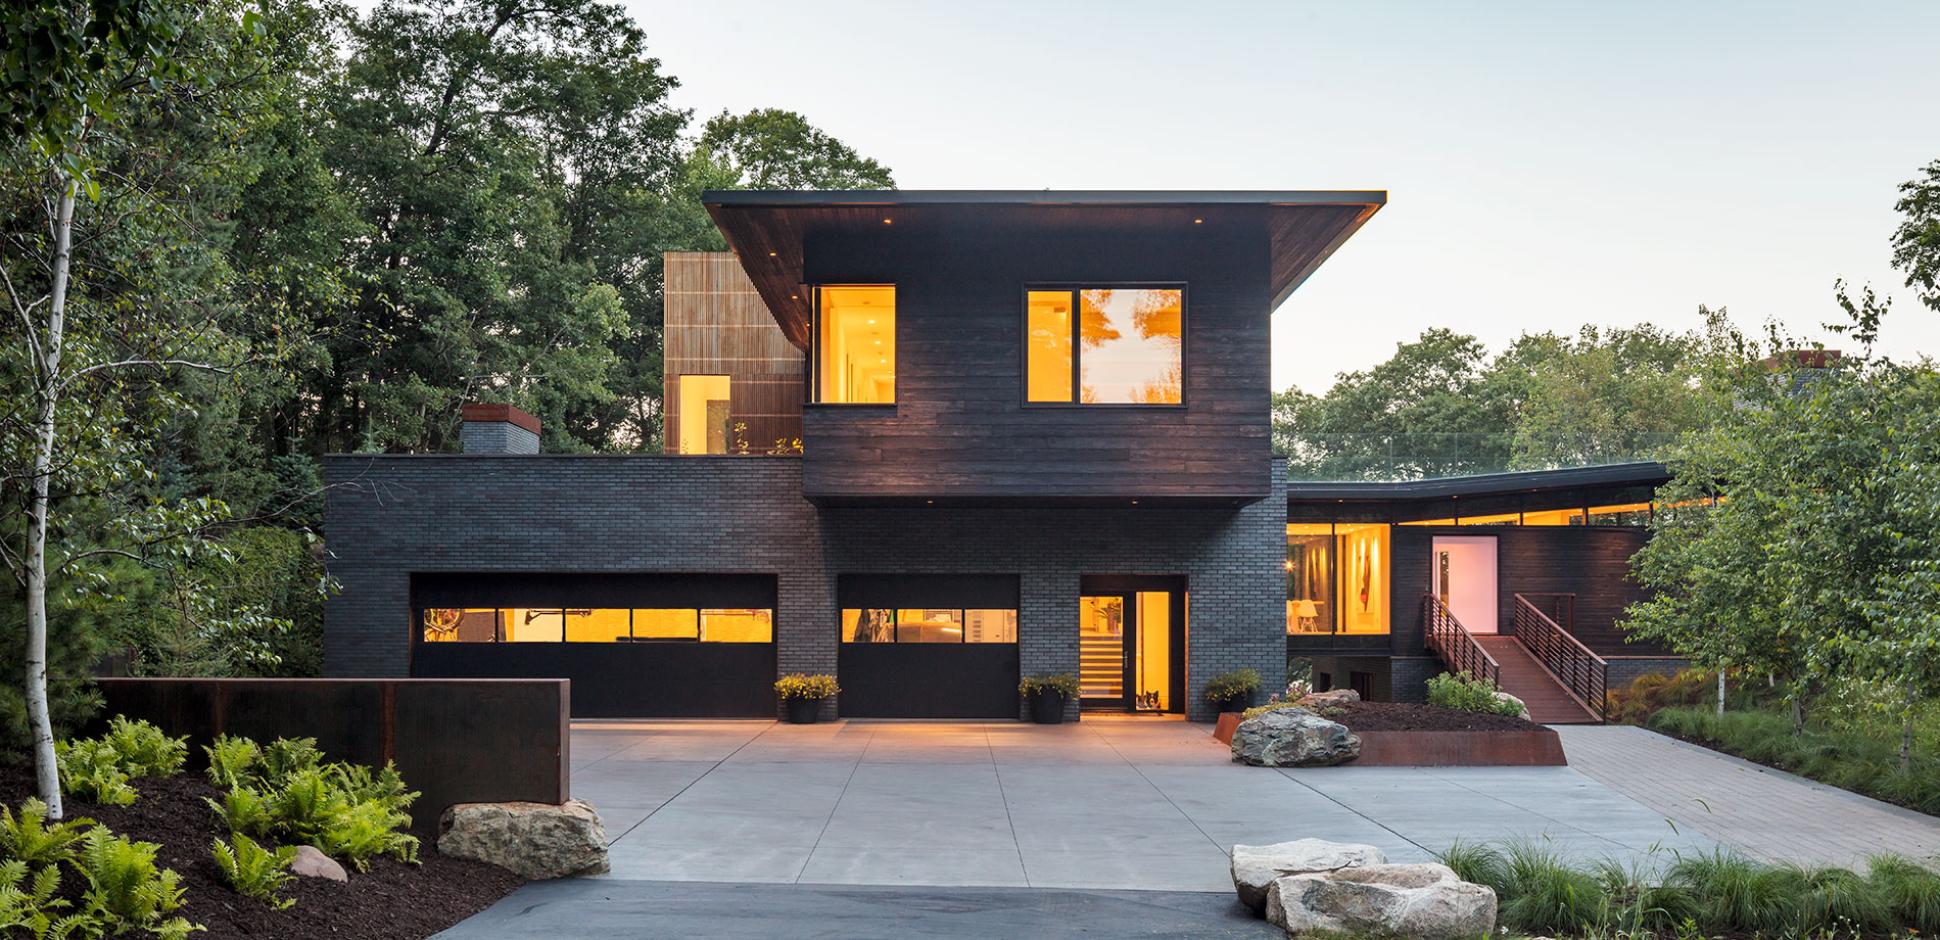 Shadow Box Sala Architects